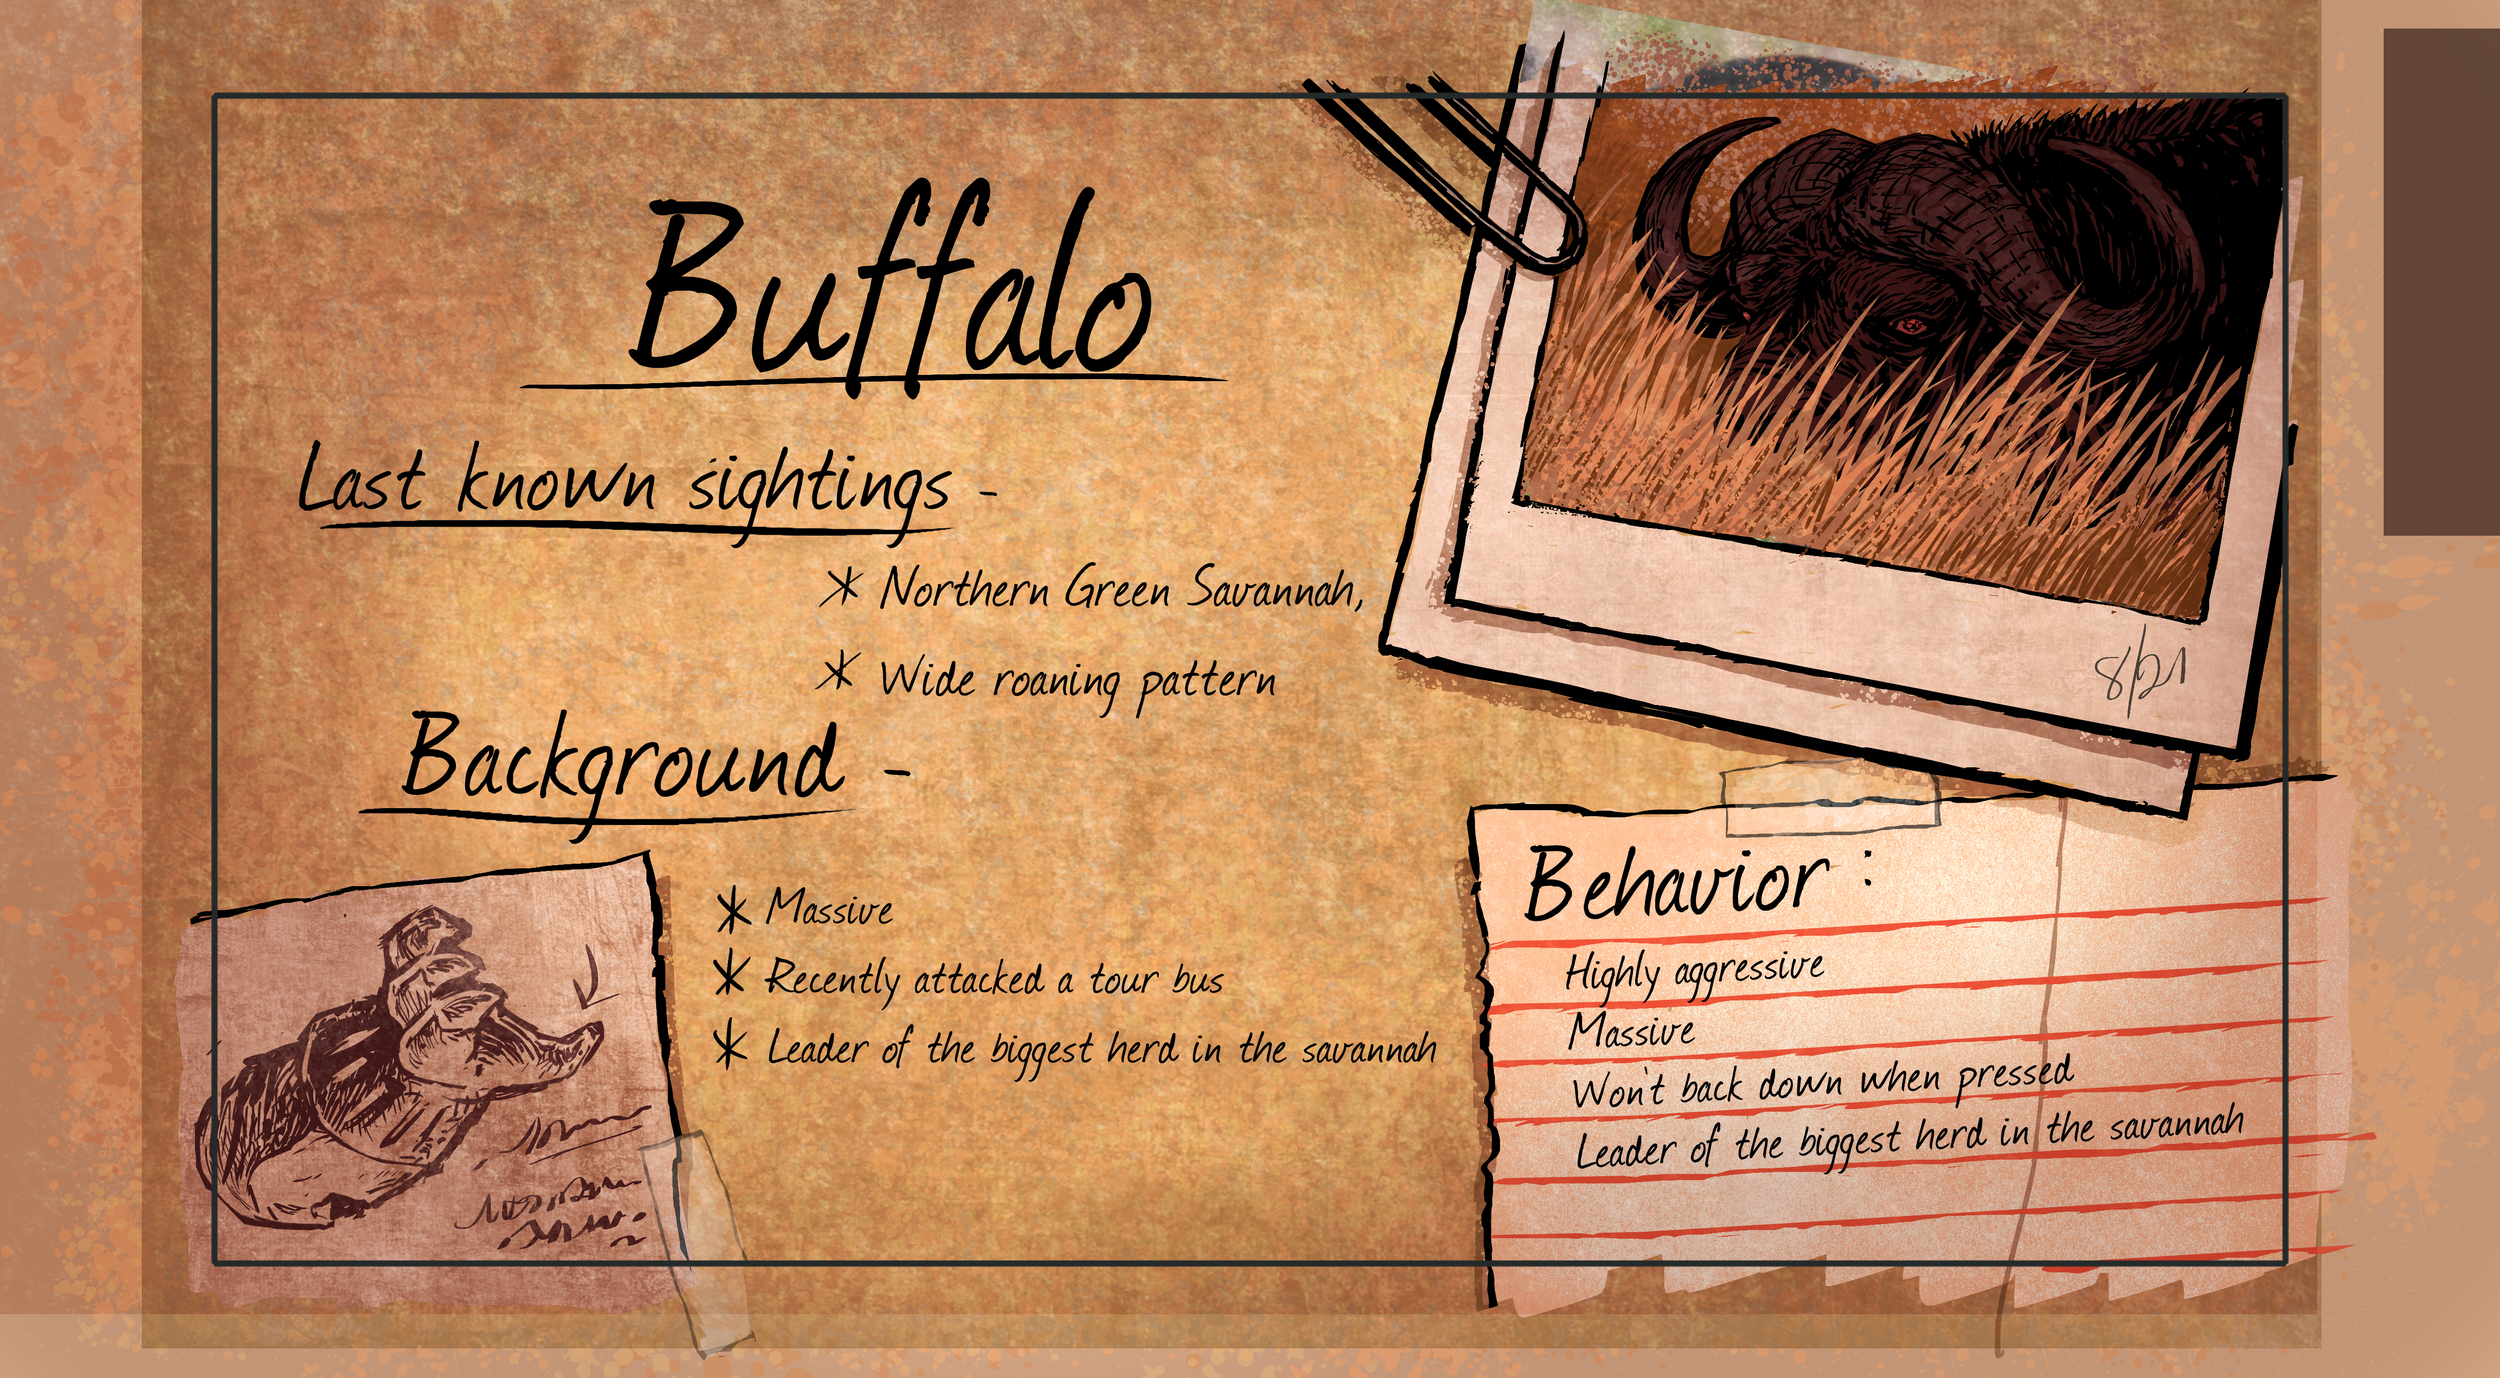 loadingbuffalo.jpg